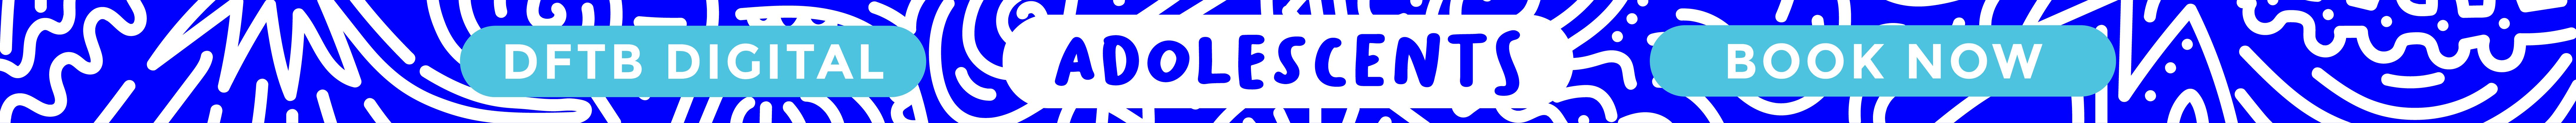 DFTB Banner